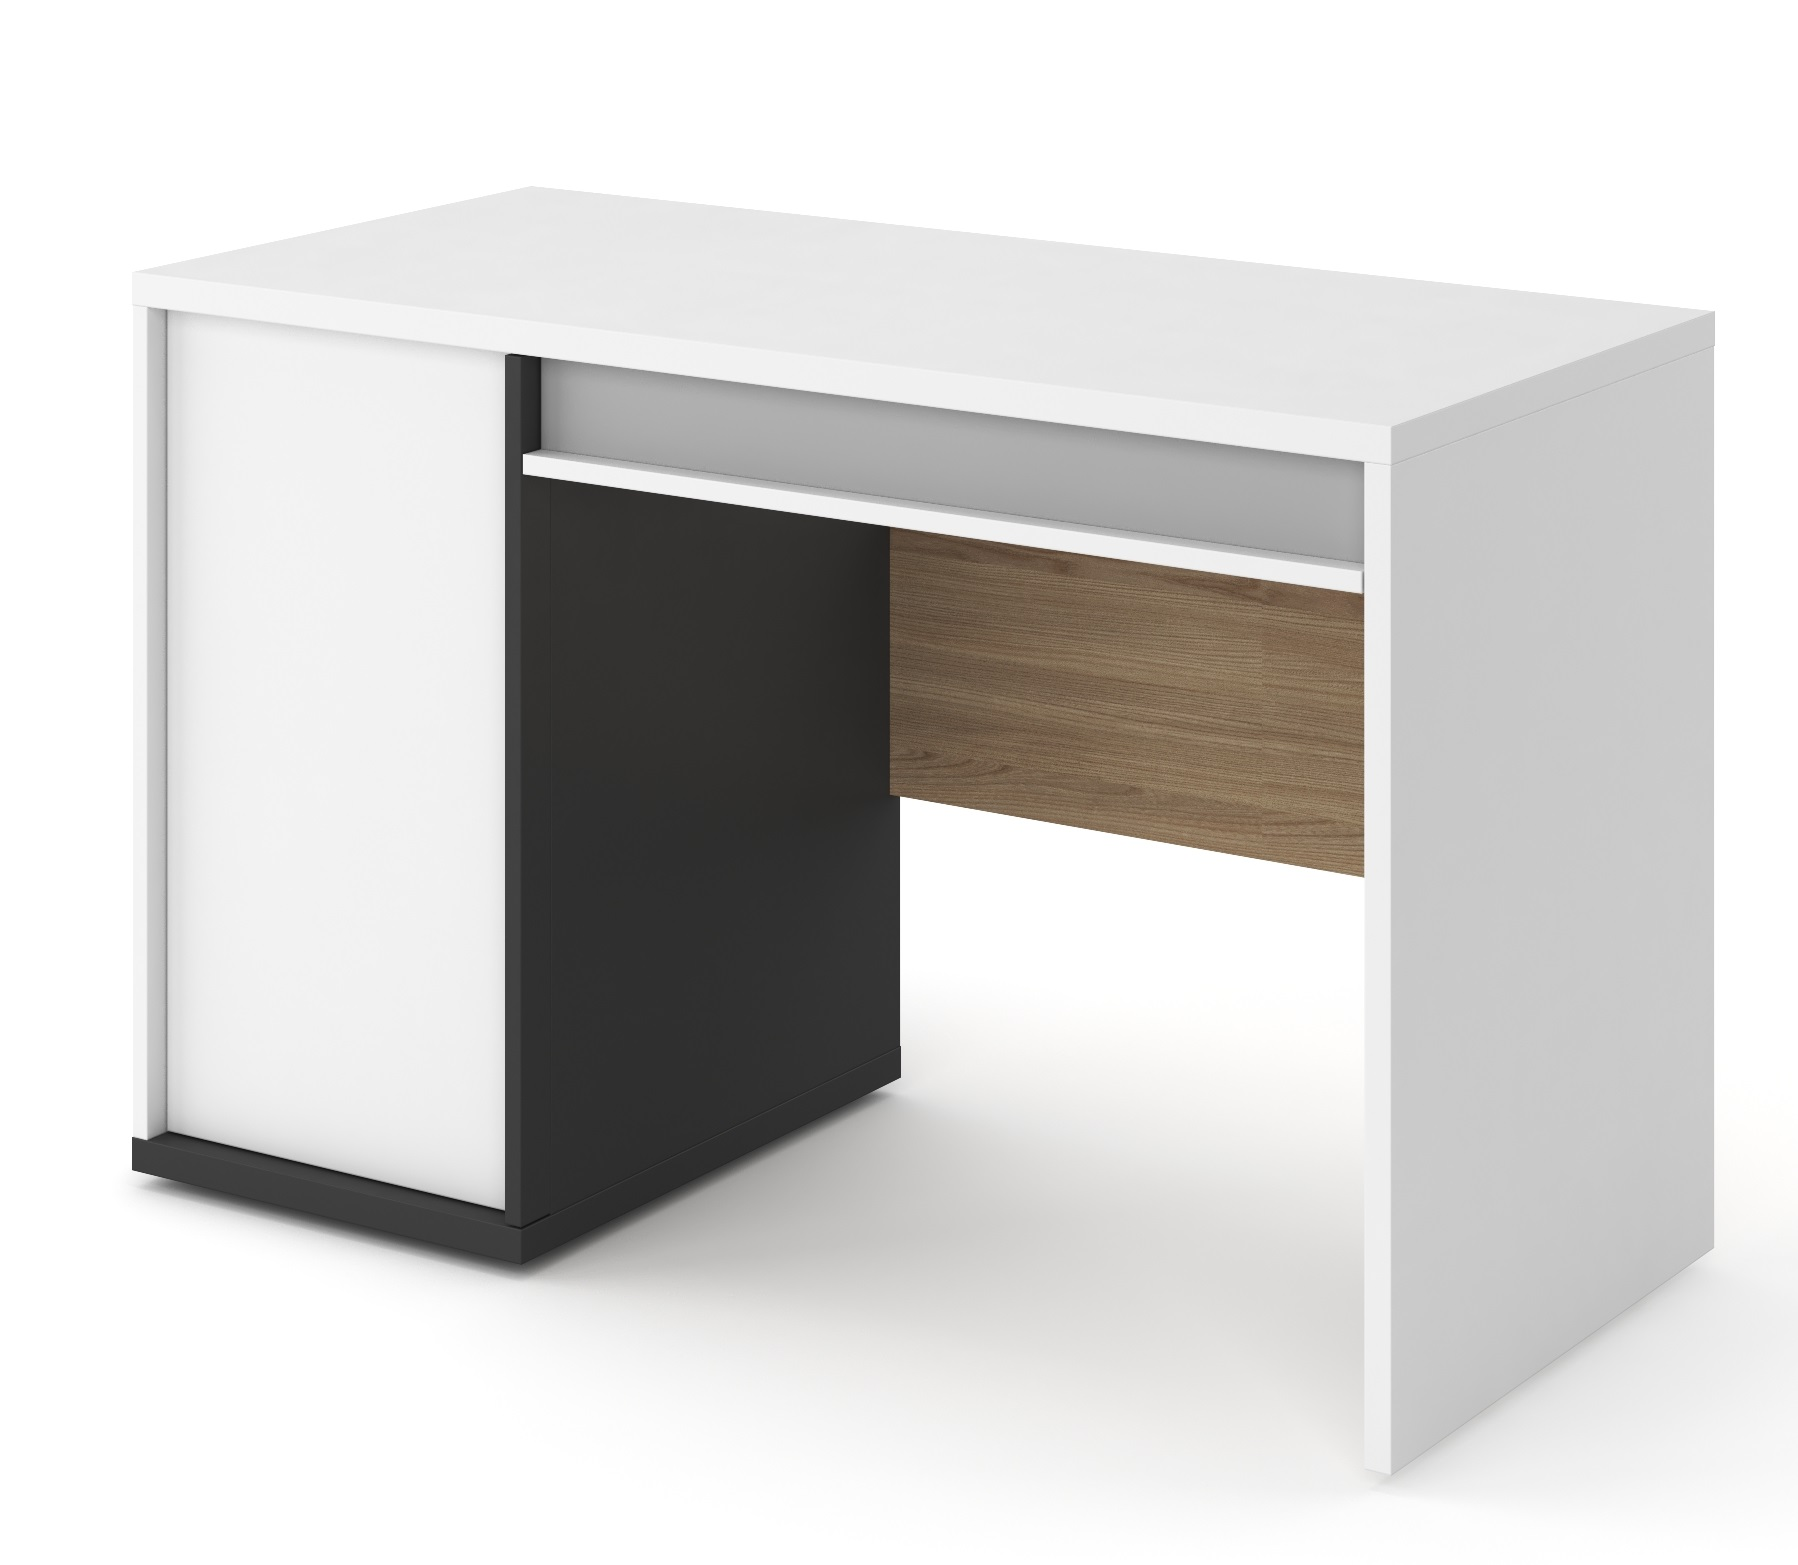 Dig-net nábytok Písací stolík Imola IM-09